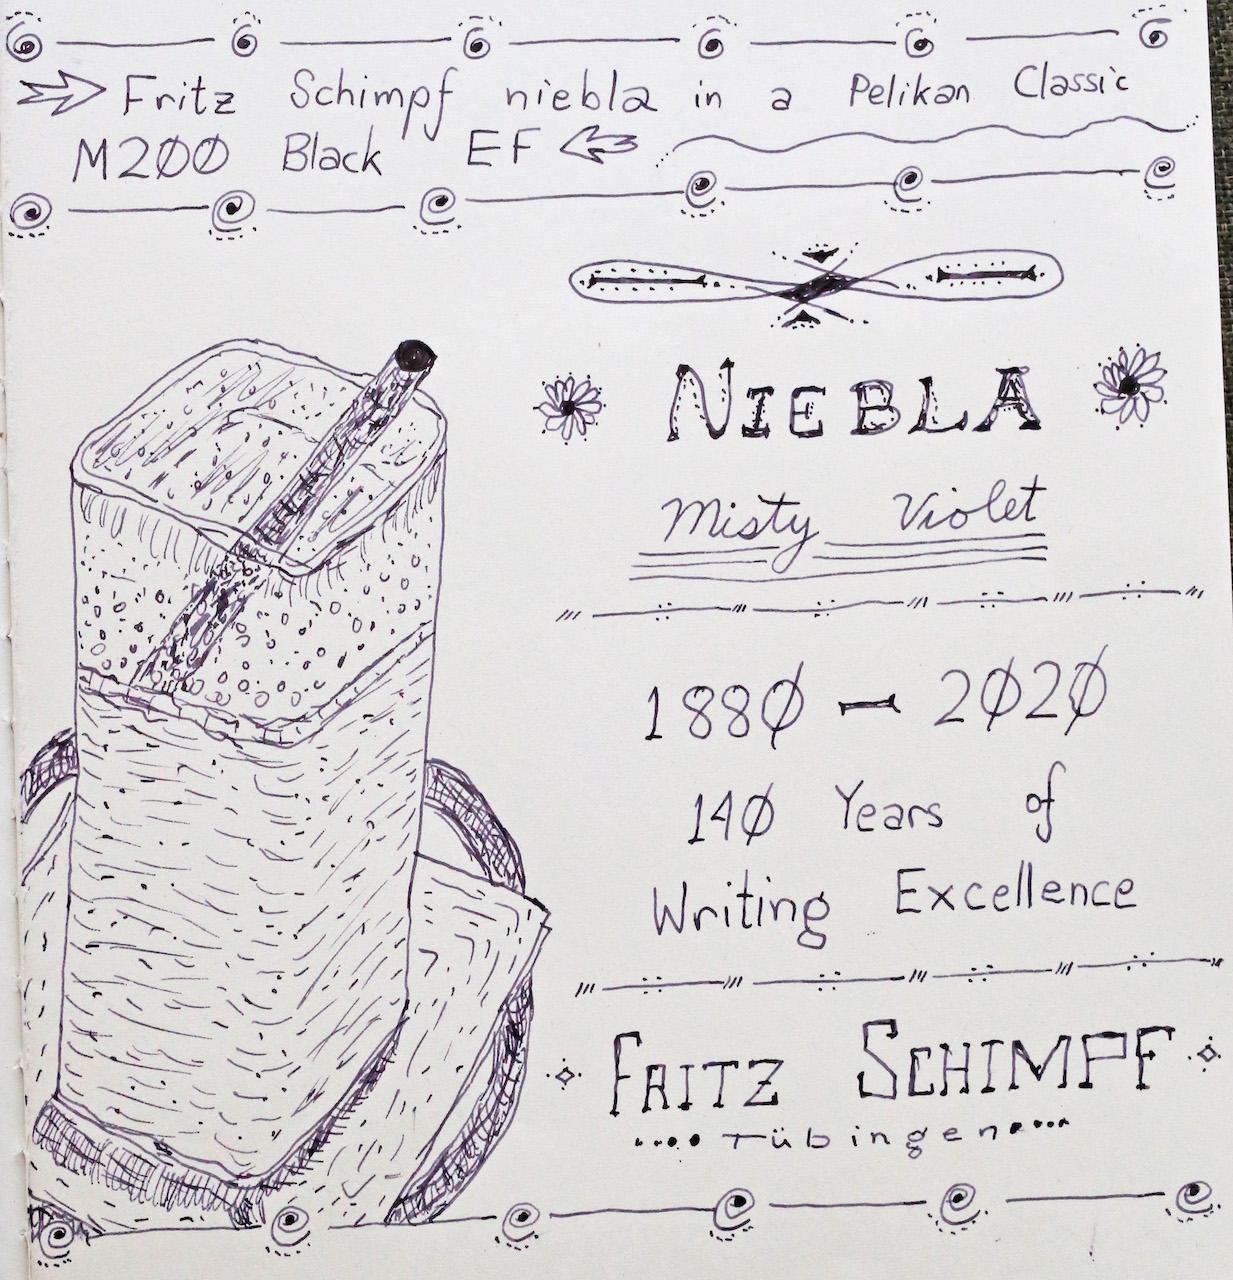 fpn_1600216804__fritz_schimpf_niebla.jpg